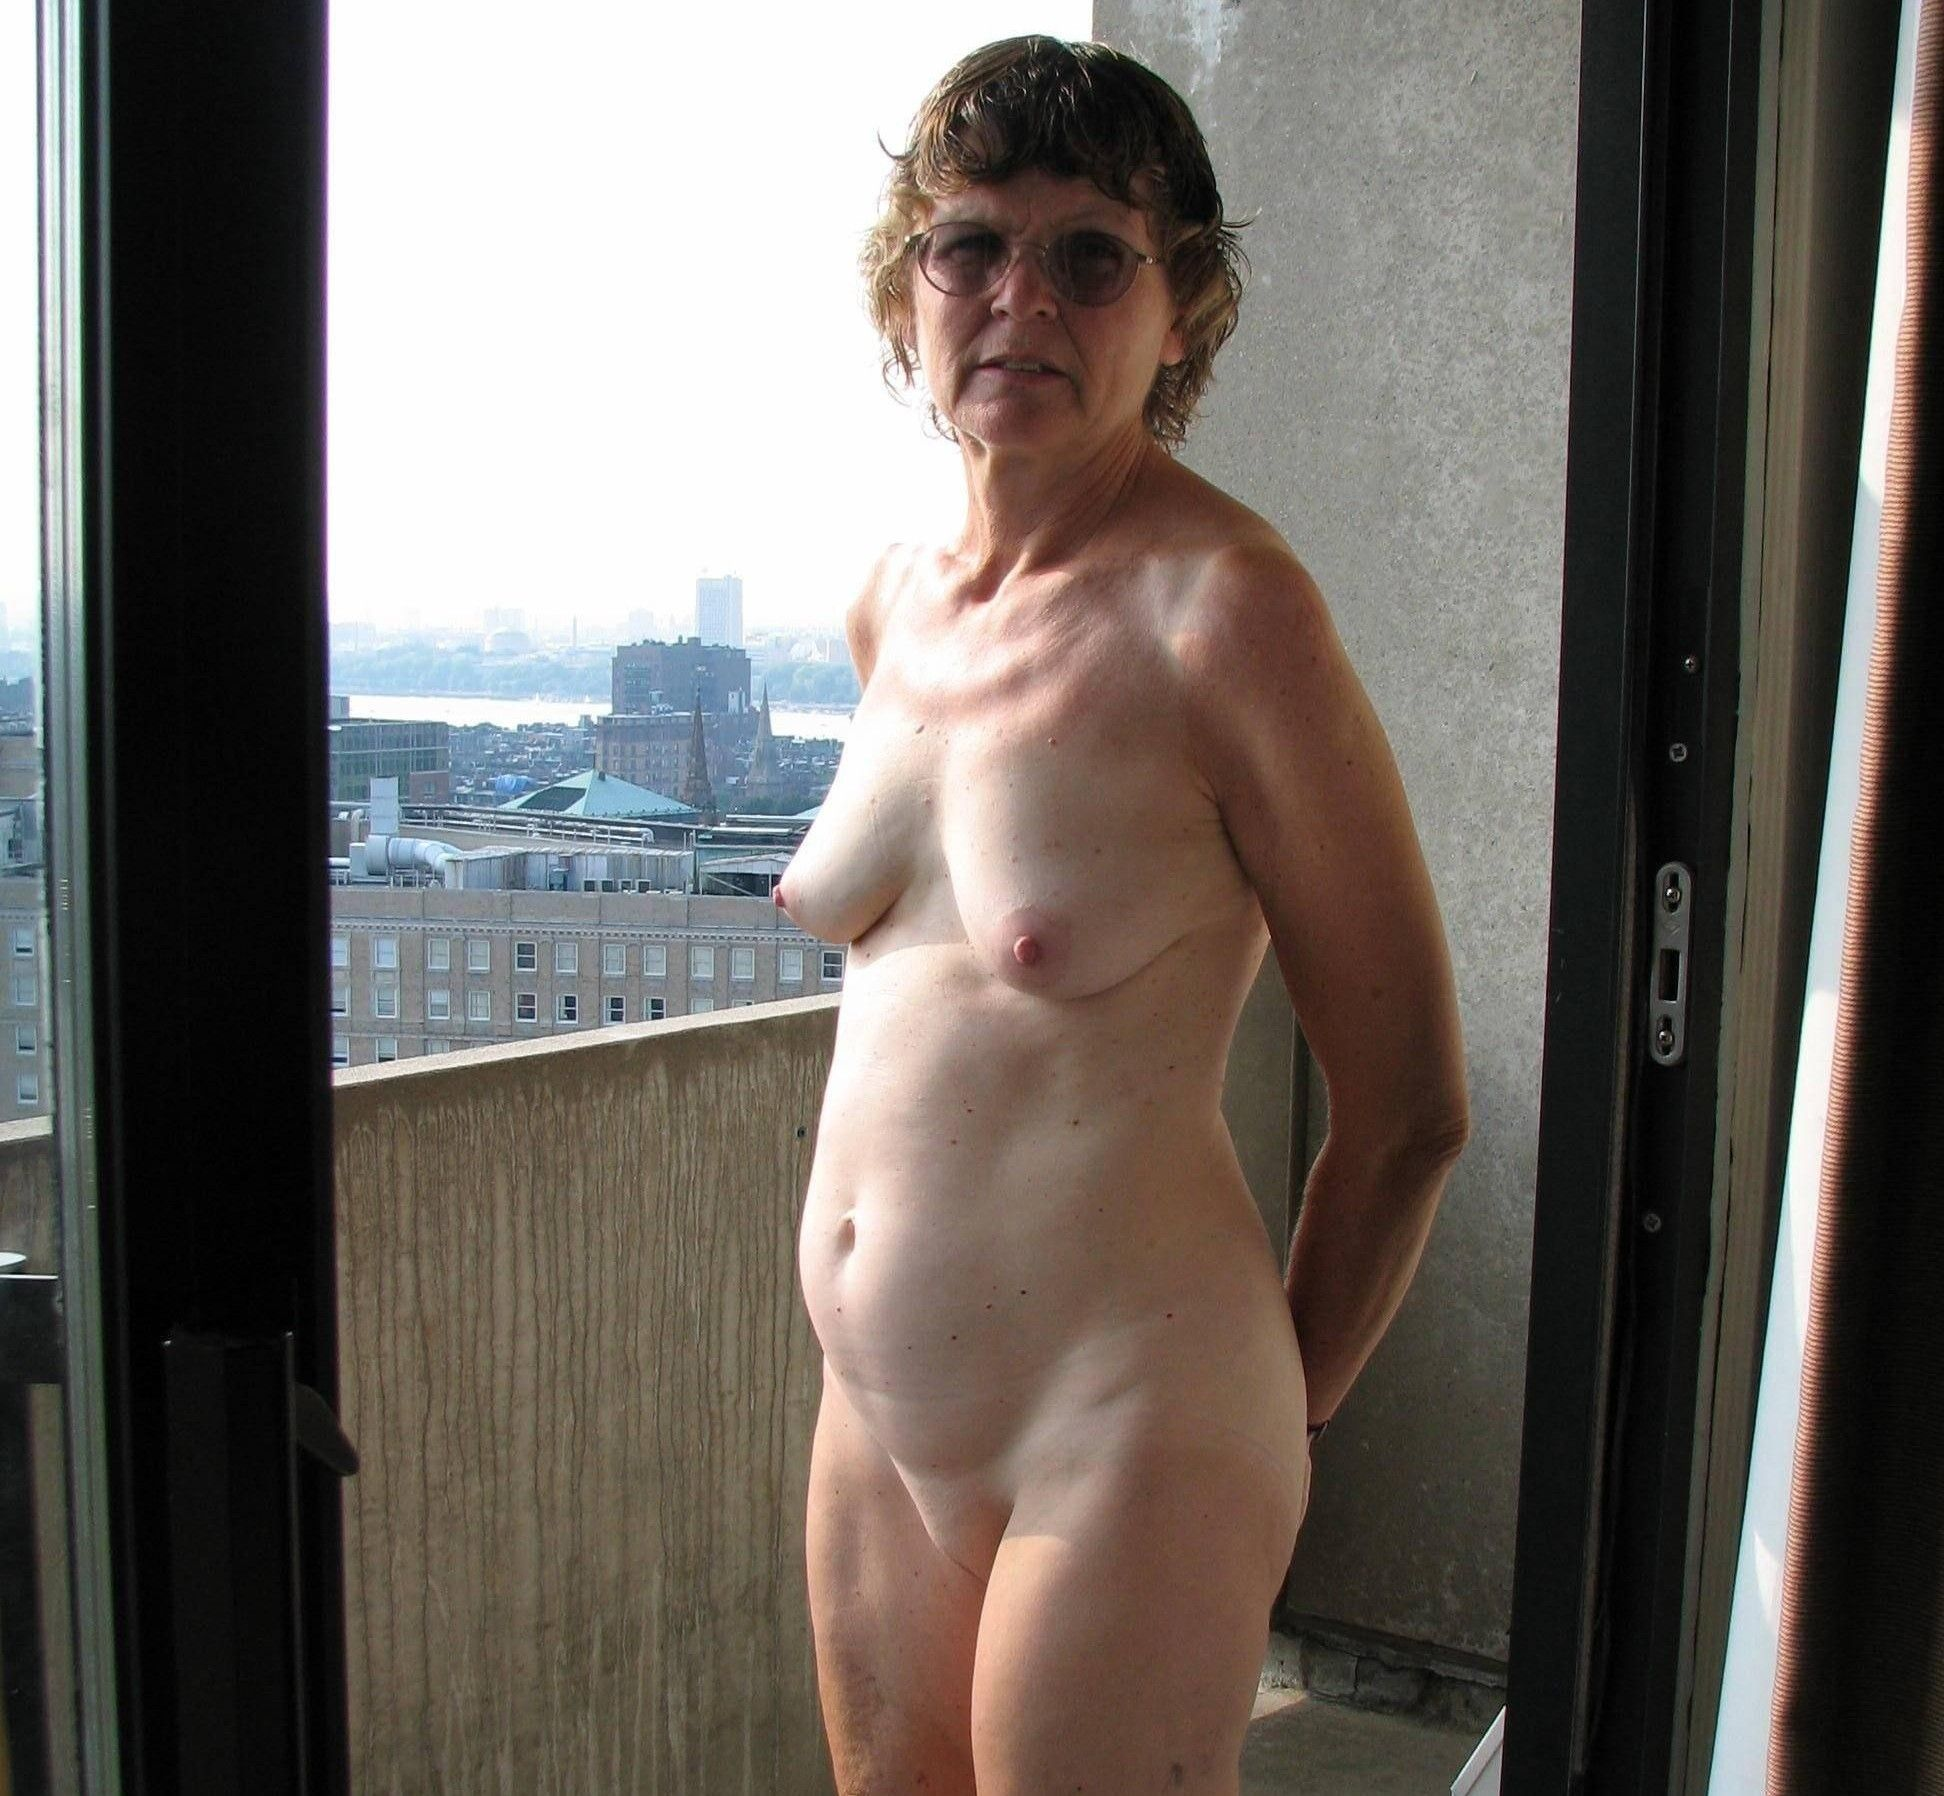 femme mûre nu tu kiff.com